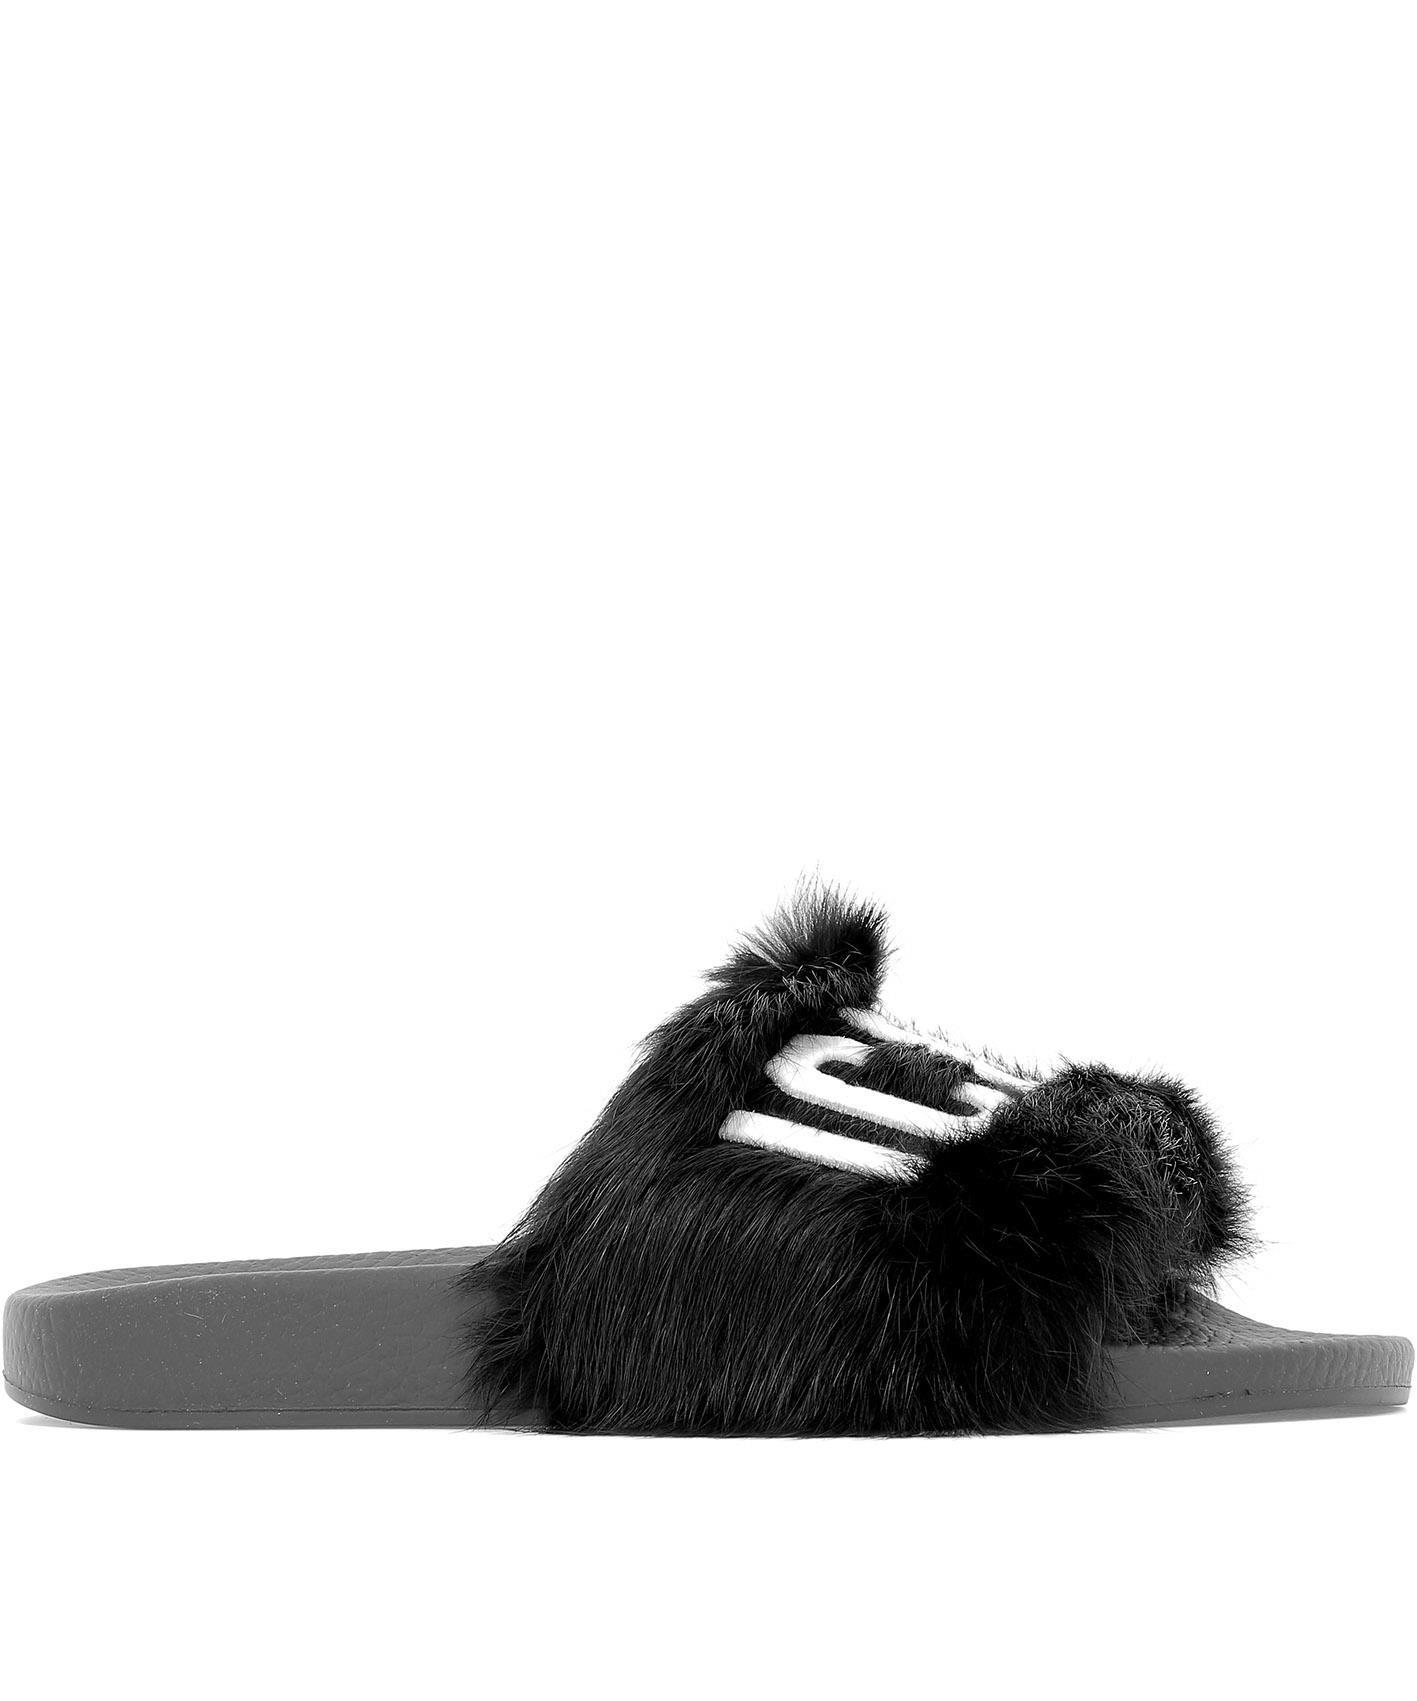 Dsquared2 Black Leather Sandals